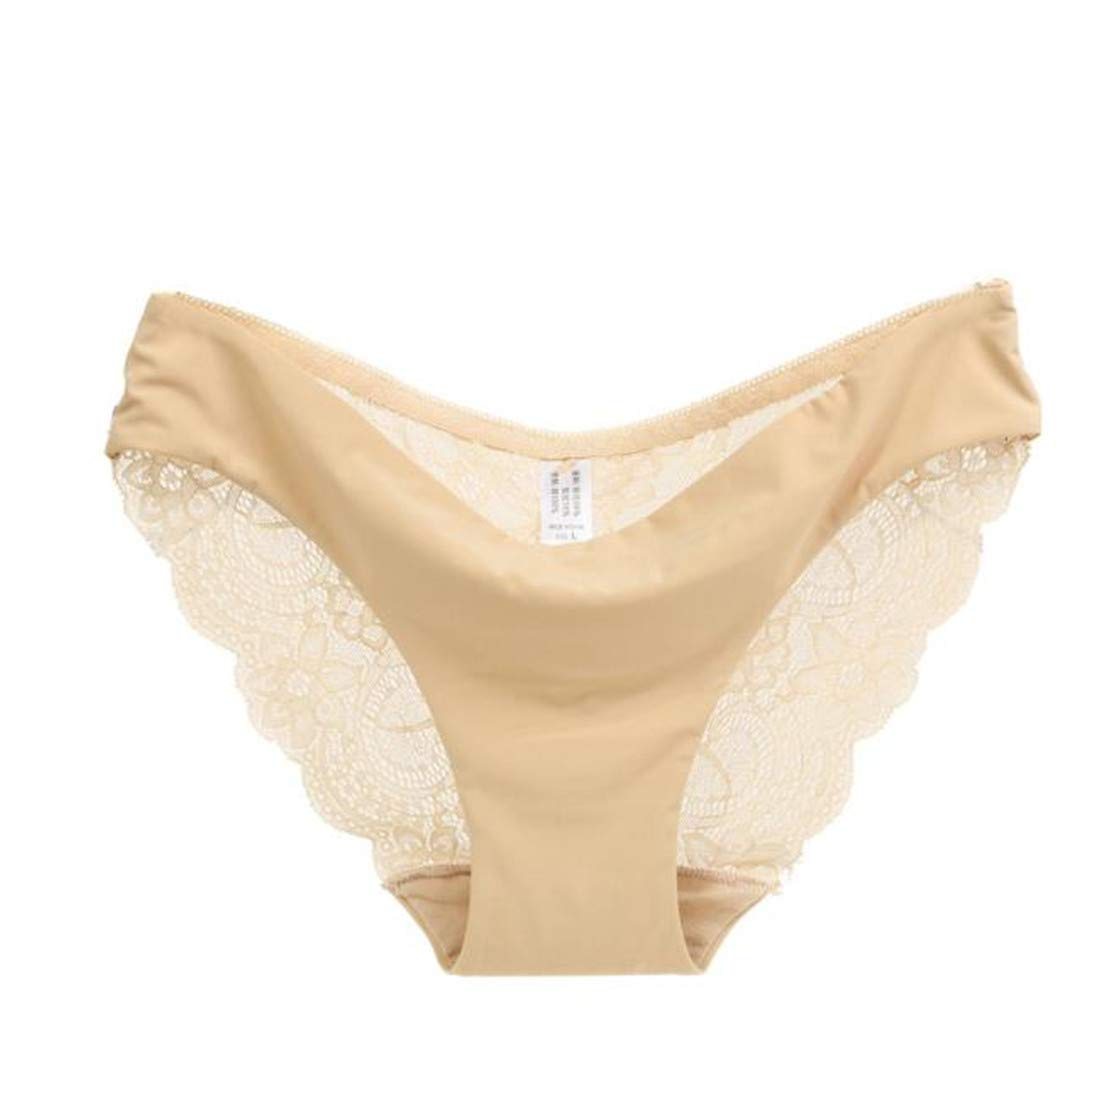 ff1e291ca23 Amazon.com  NEEKEY Womens Intimates Lingerie Women lace Panties Seamless  Cotton Panty Hollow Briefs Underwear  Clothing